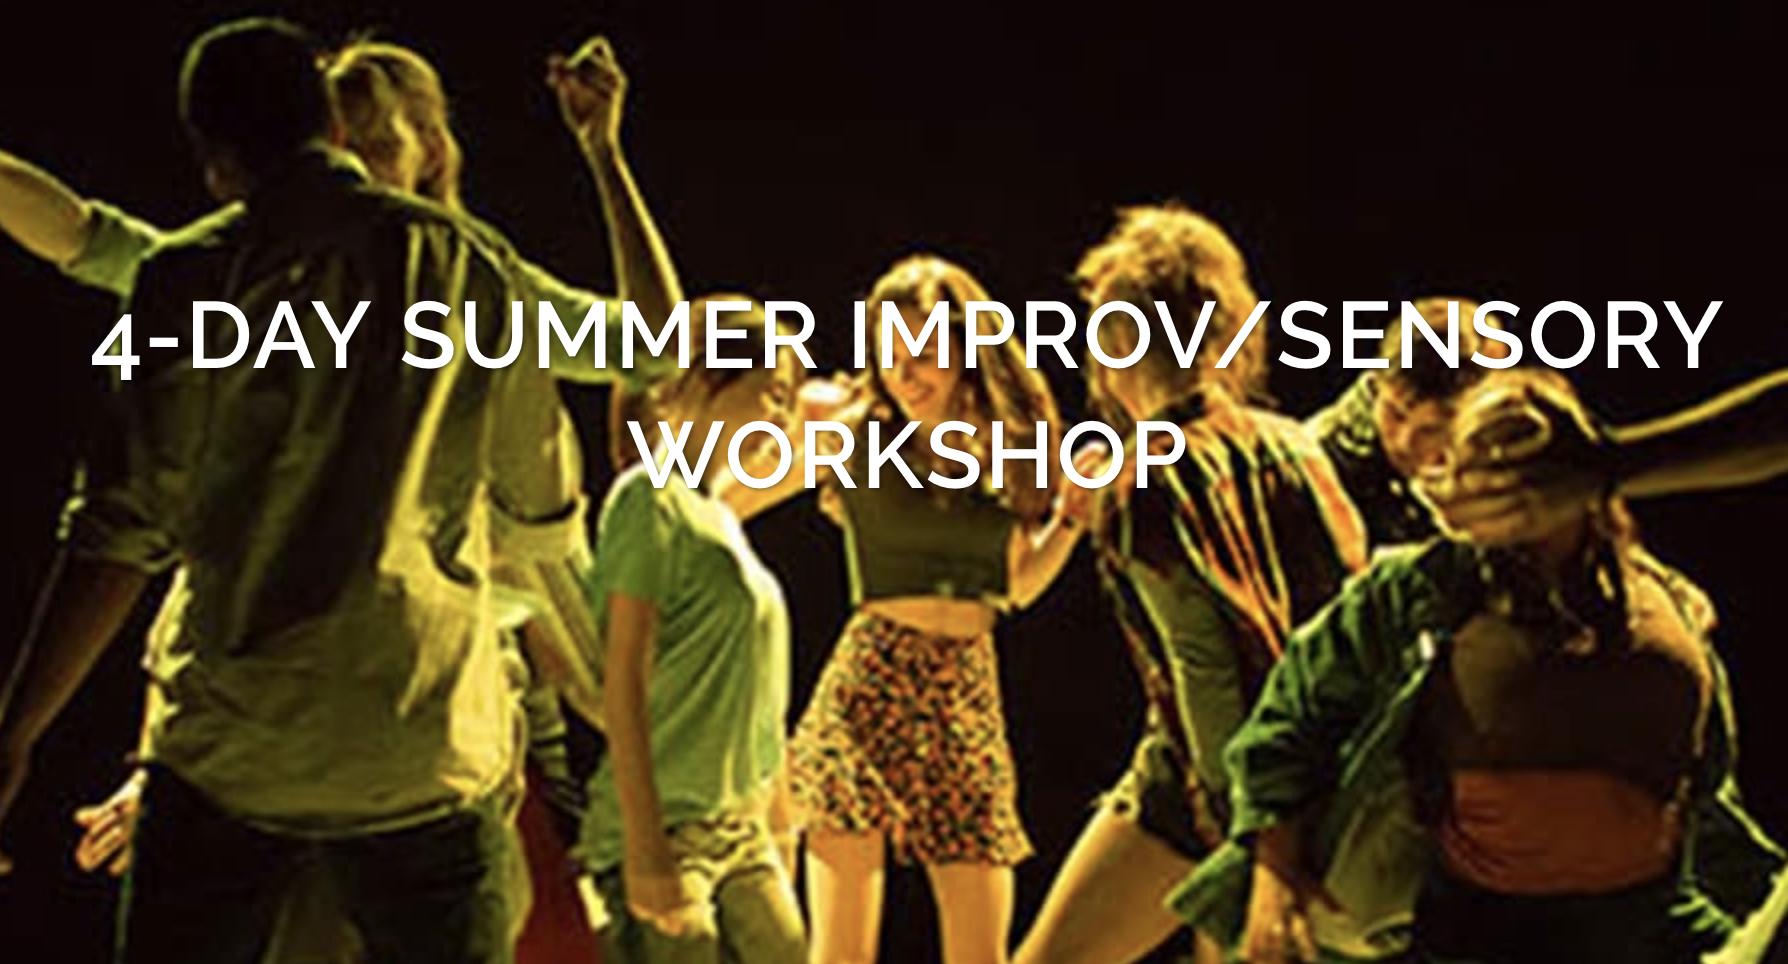 New York - Lee Strasberg Theatre & Film InstituteLee Strasberg Summer Improv/Sensory WorkshopImprov for the Comedic ActorTuesday, July 16 9:00AM – 1:00PM